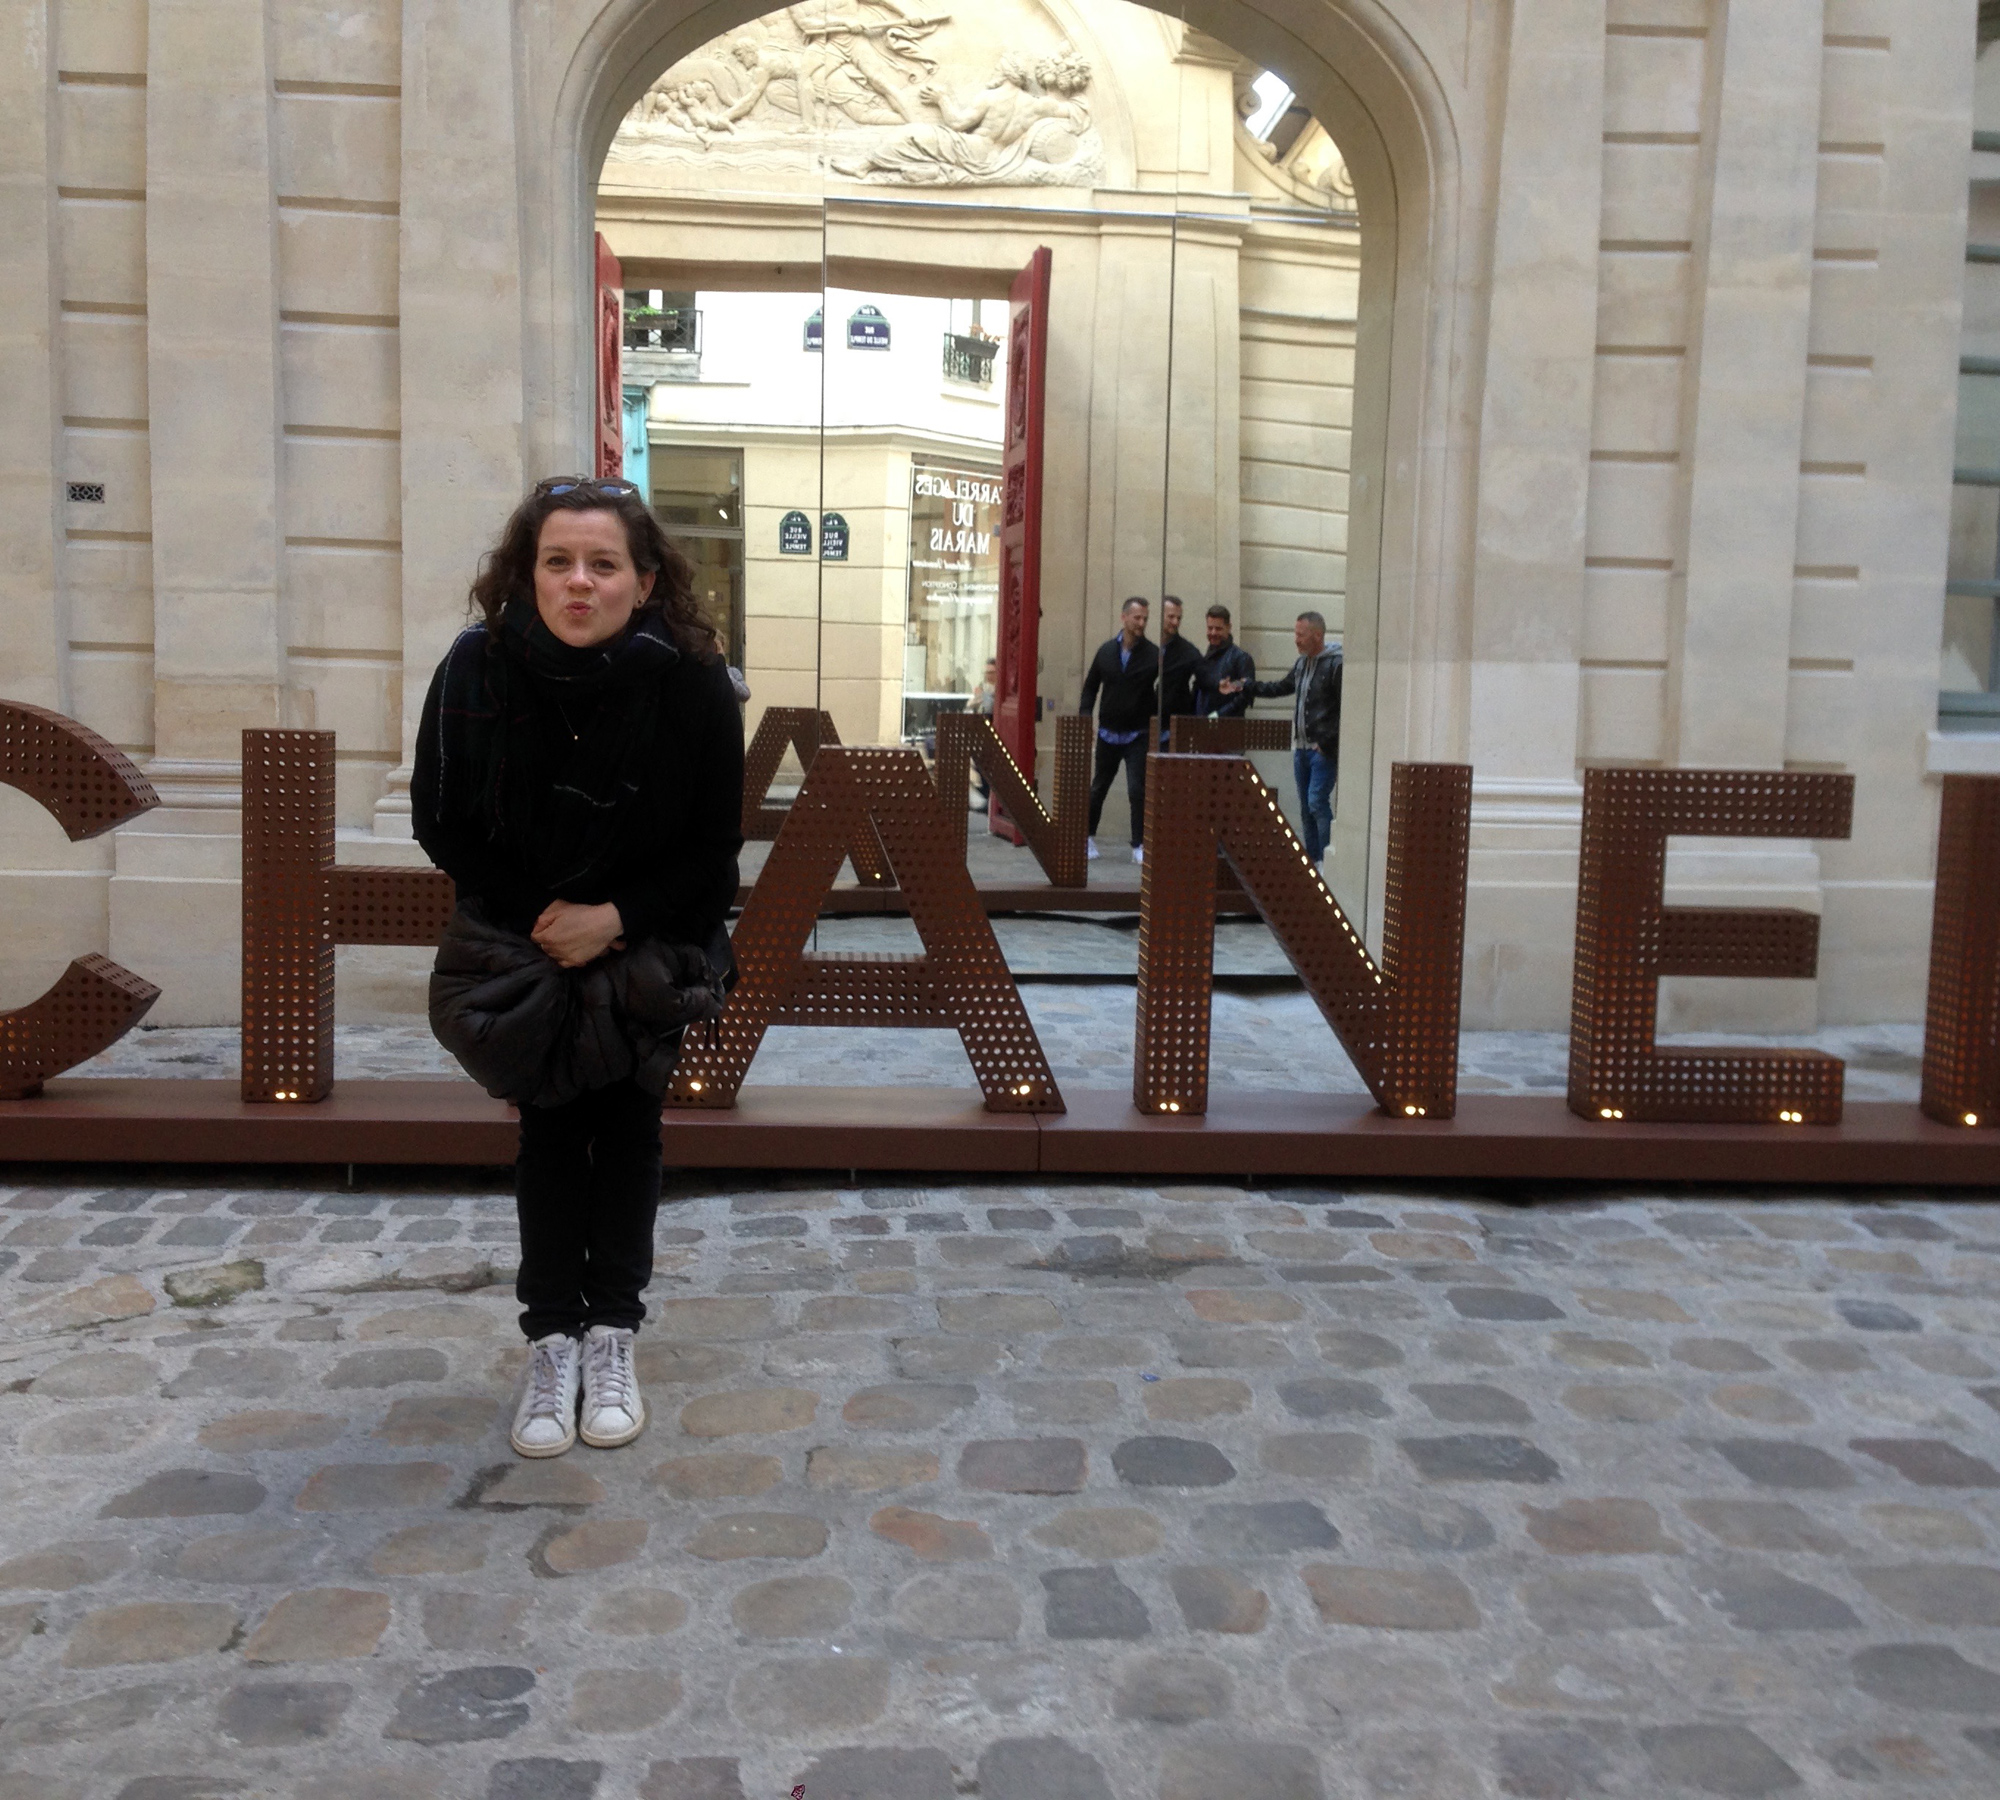 Doro mit ihrer Familie in Paris // HIMBEER